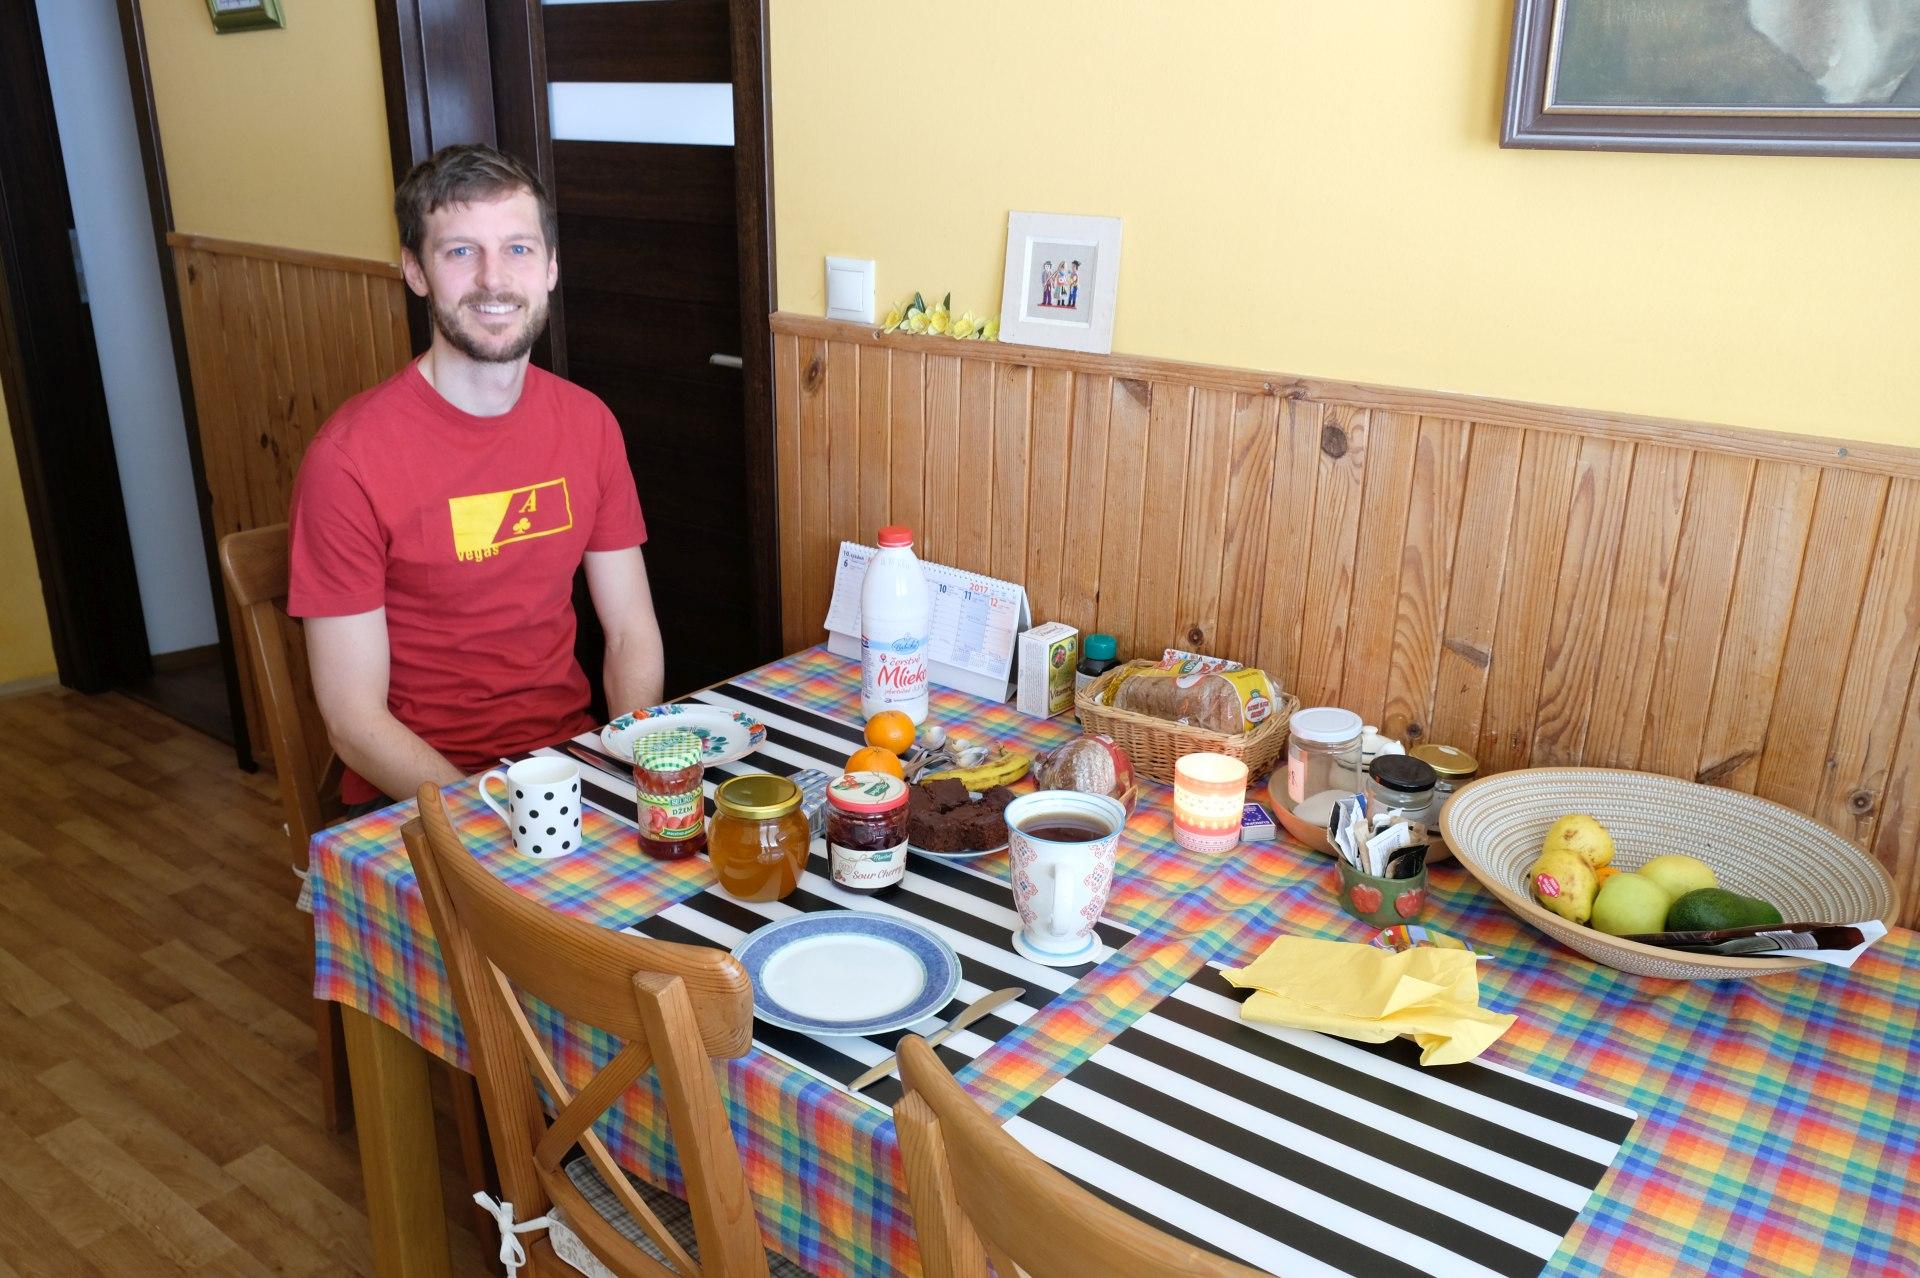 Sebastian sitzt an einem Frühstückstisch